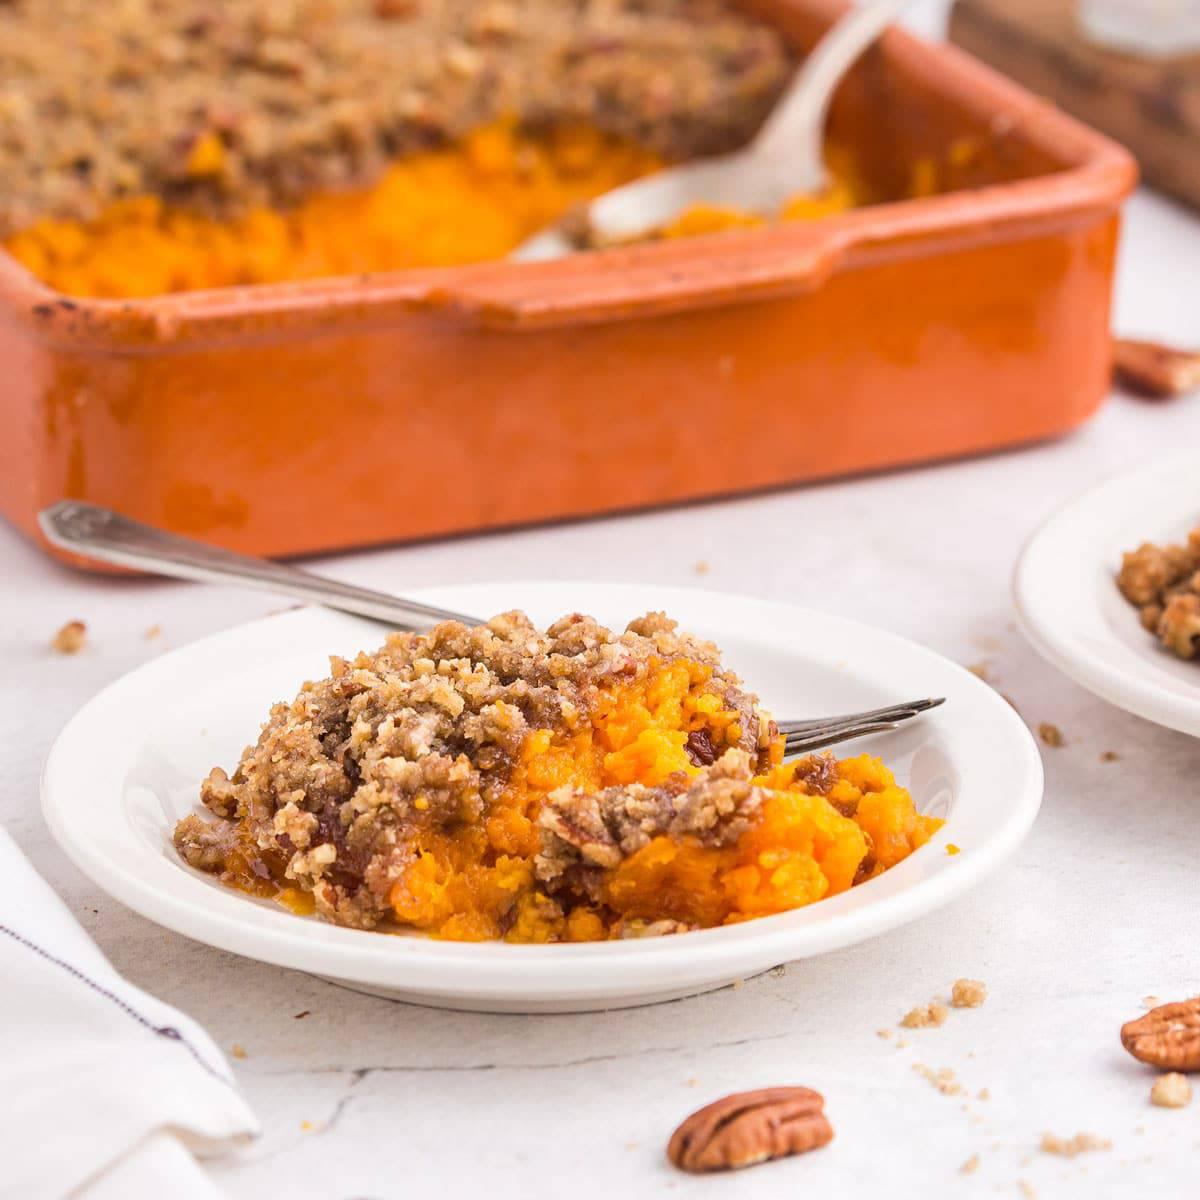 A serving of sweet potato souffle